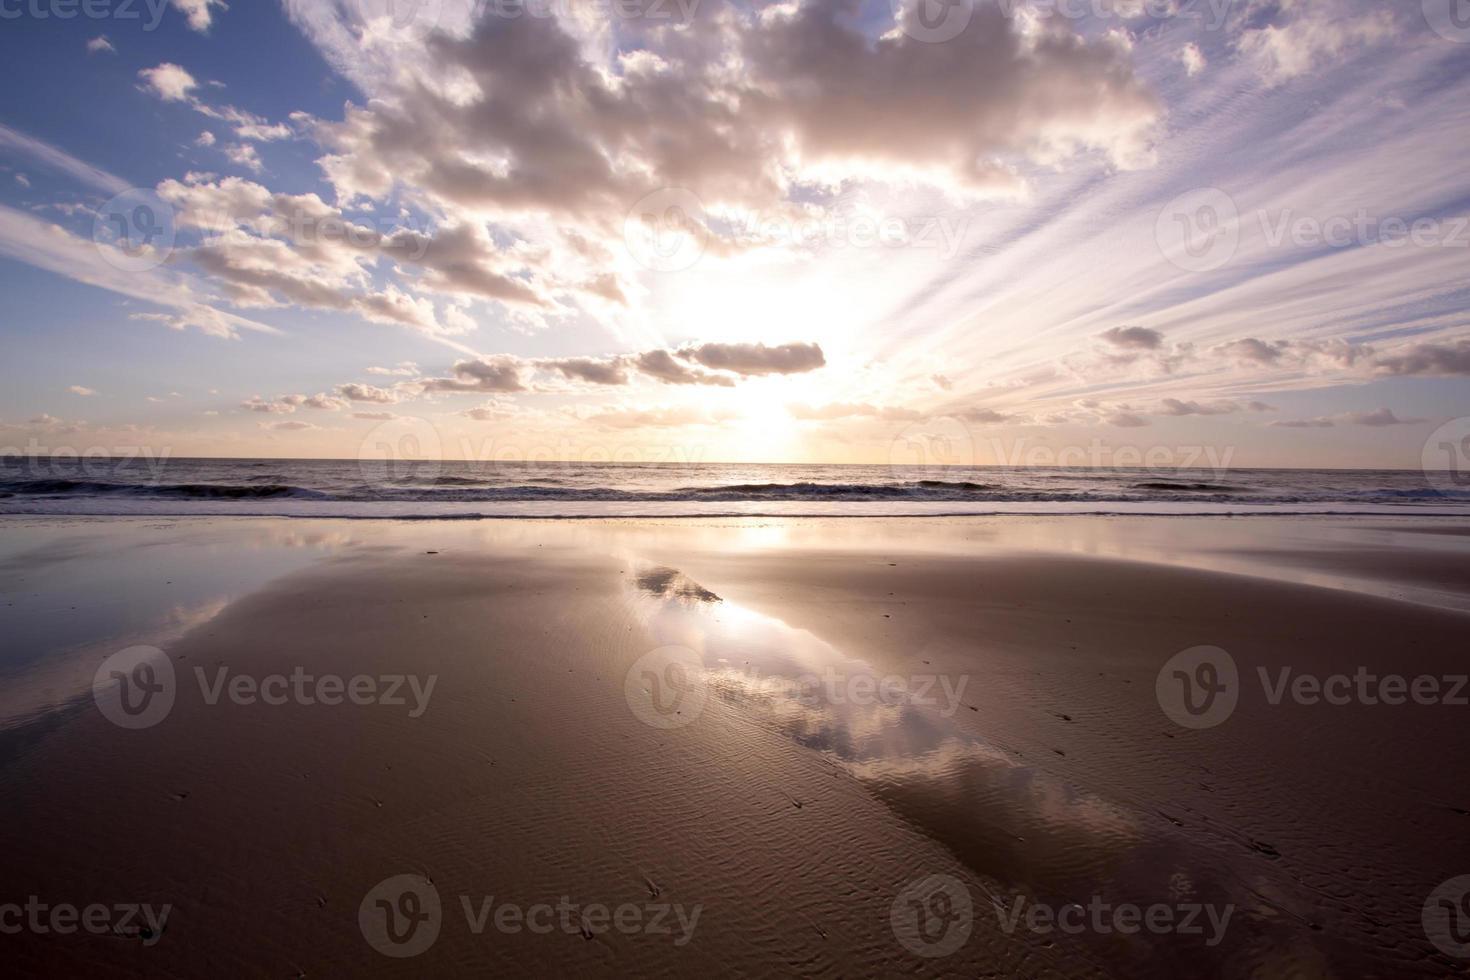 pintoresco paisaje marino foto